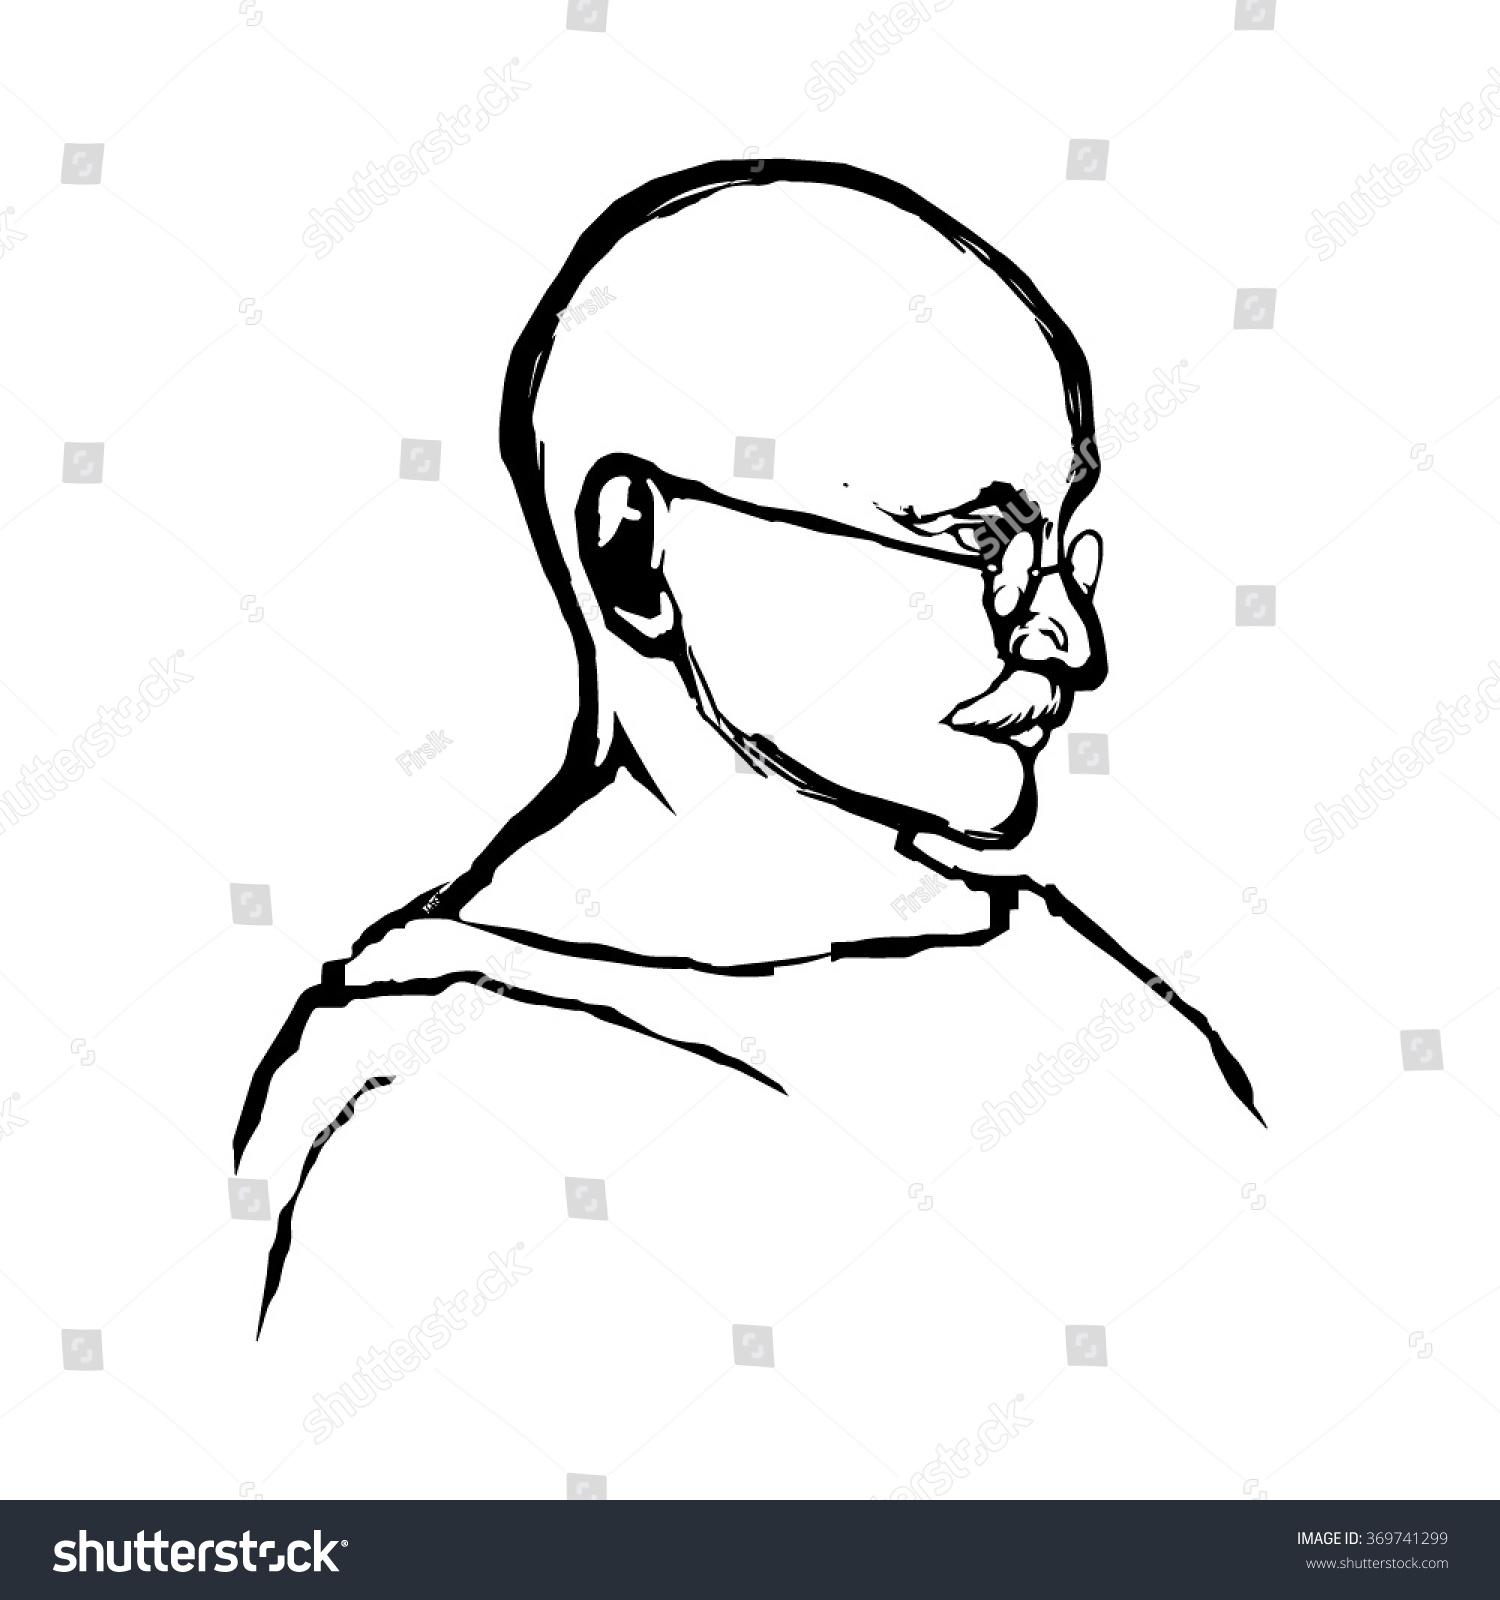 Gandhiji easy drawing pictures gandhiji pencil color photo mahatma